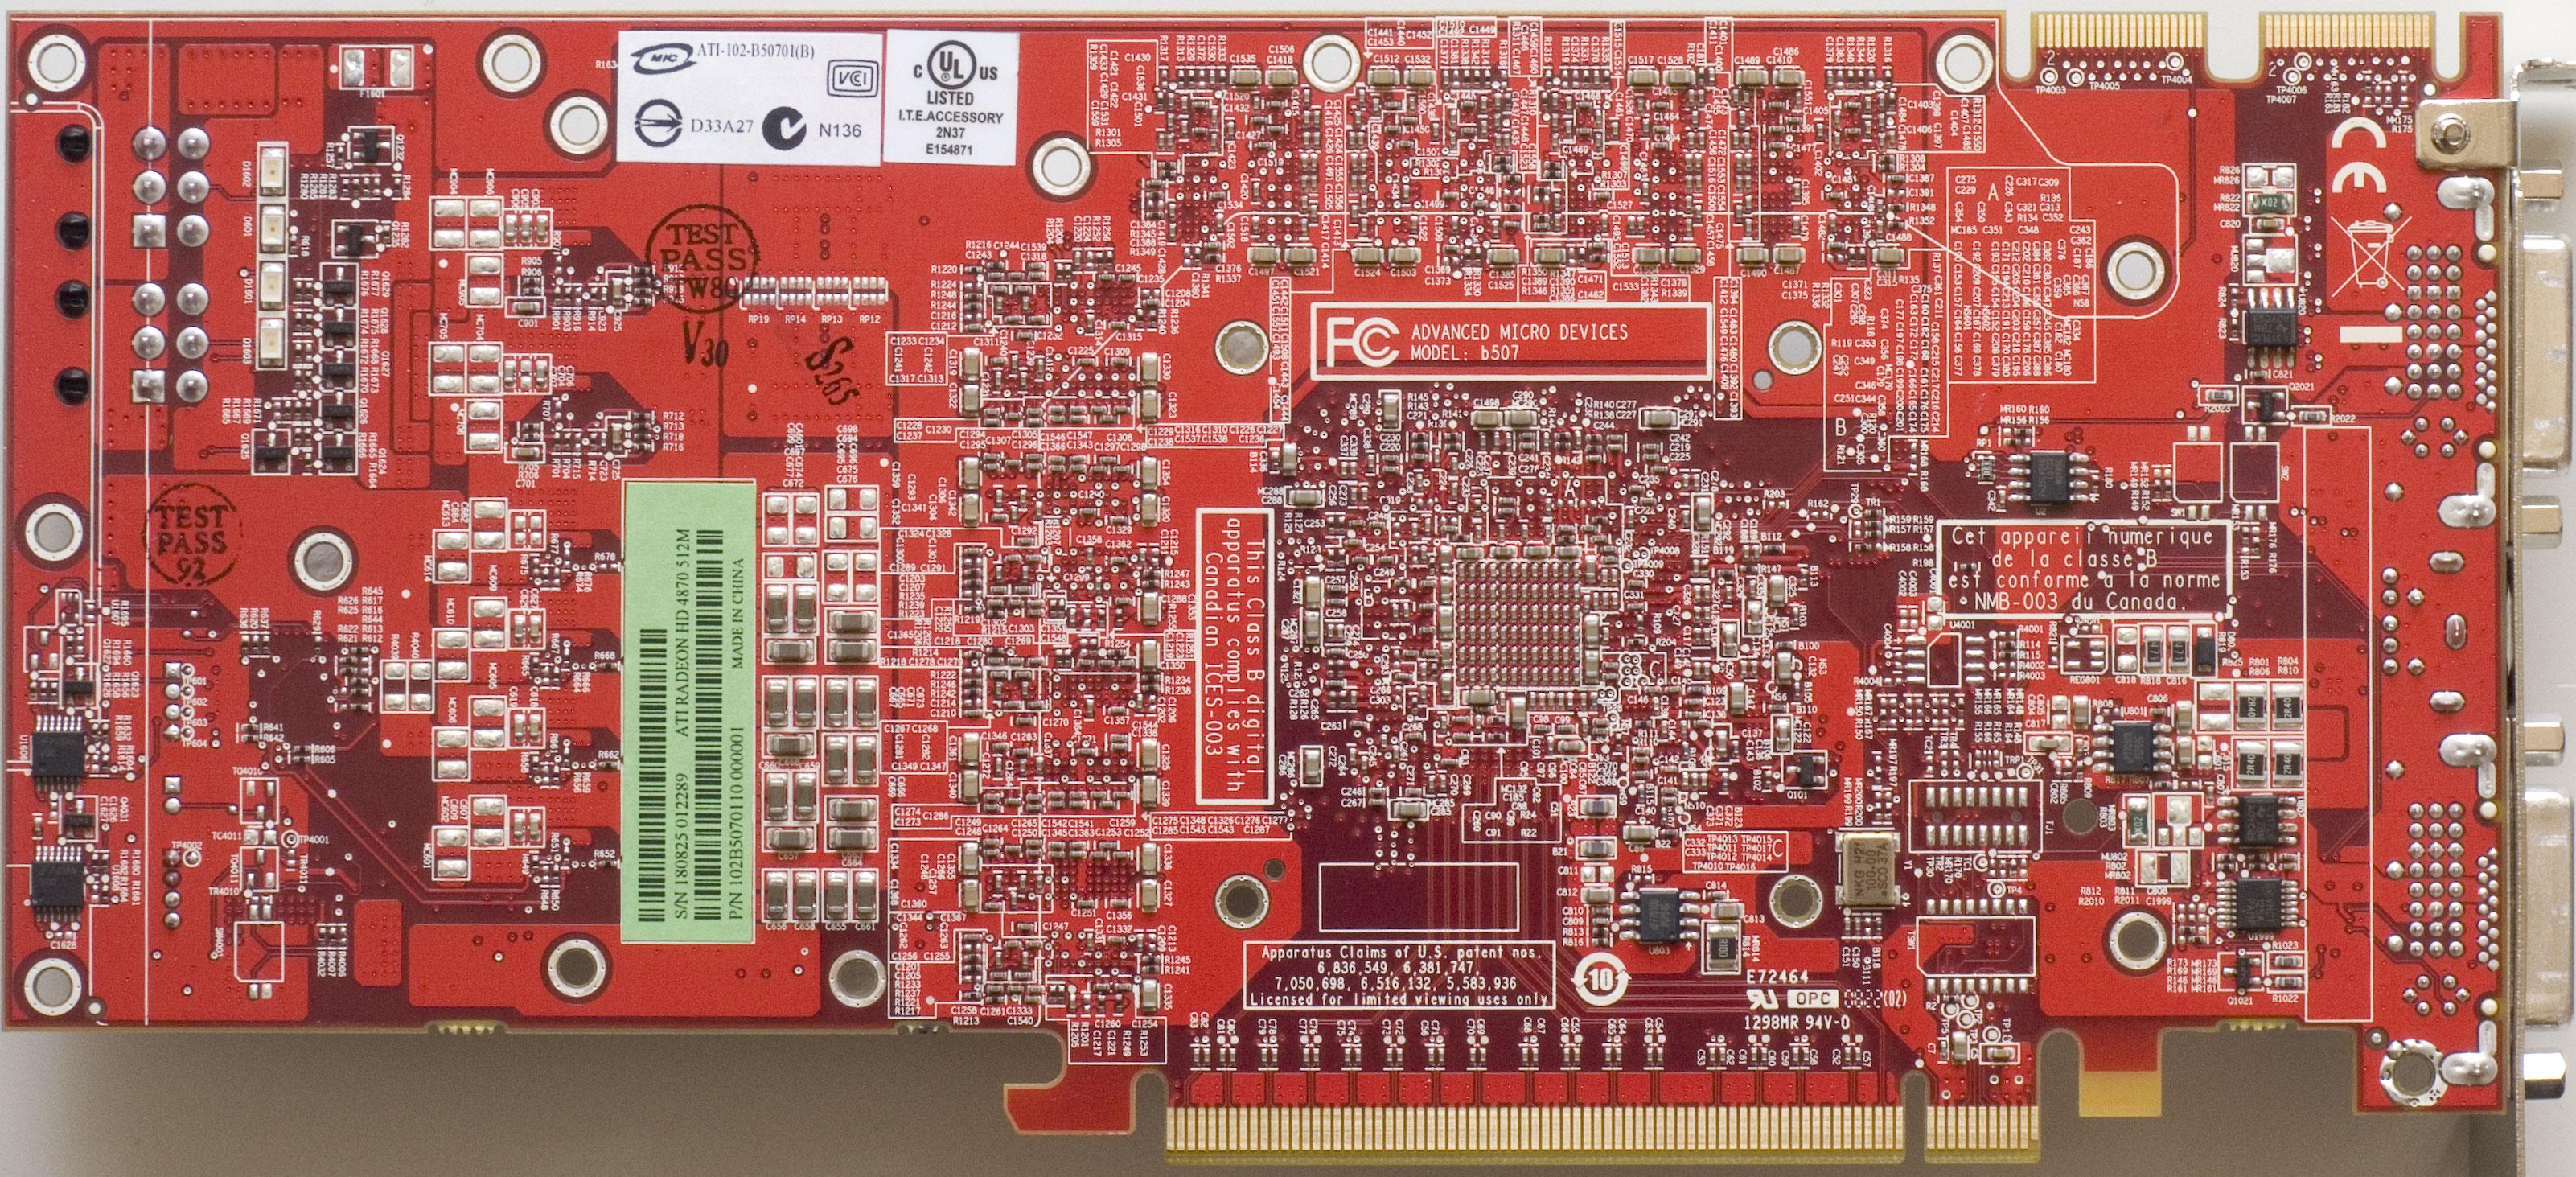 4870 Bios Chip location | TechPowerUp Forums